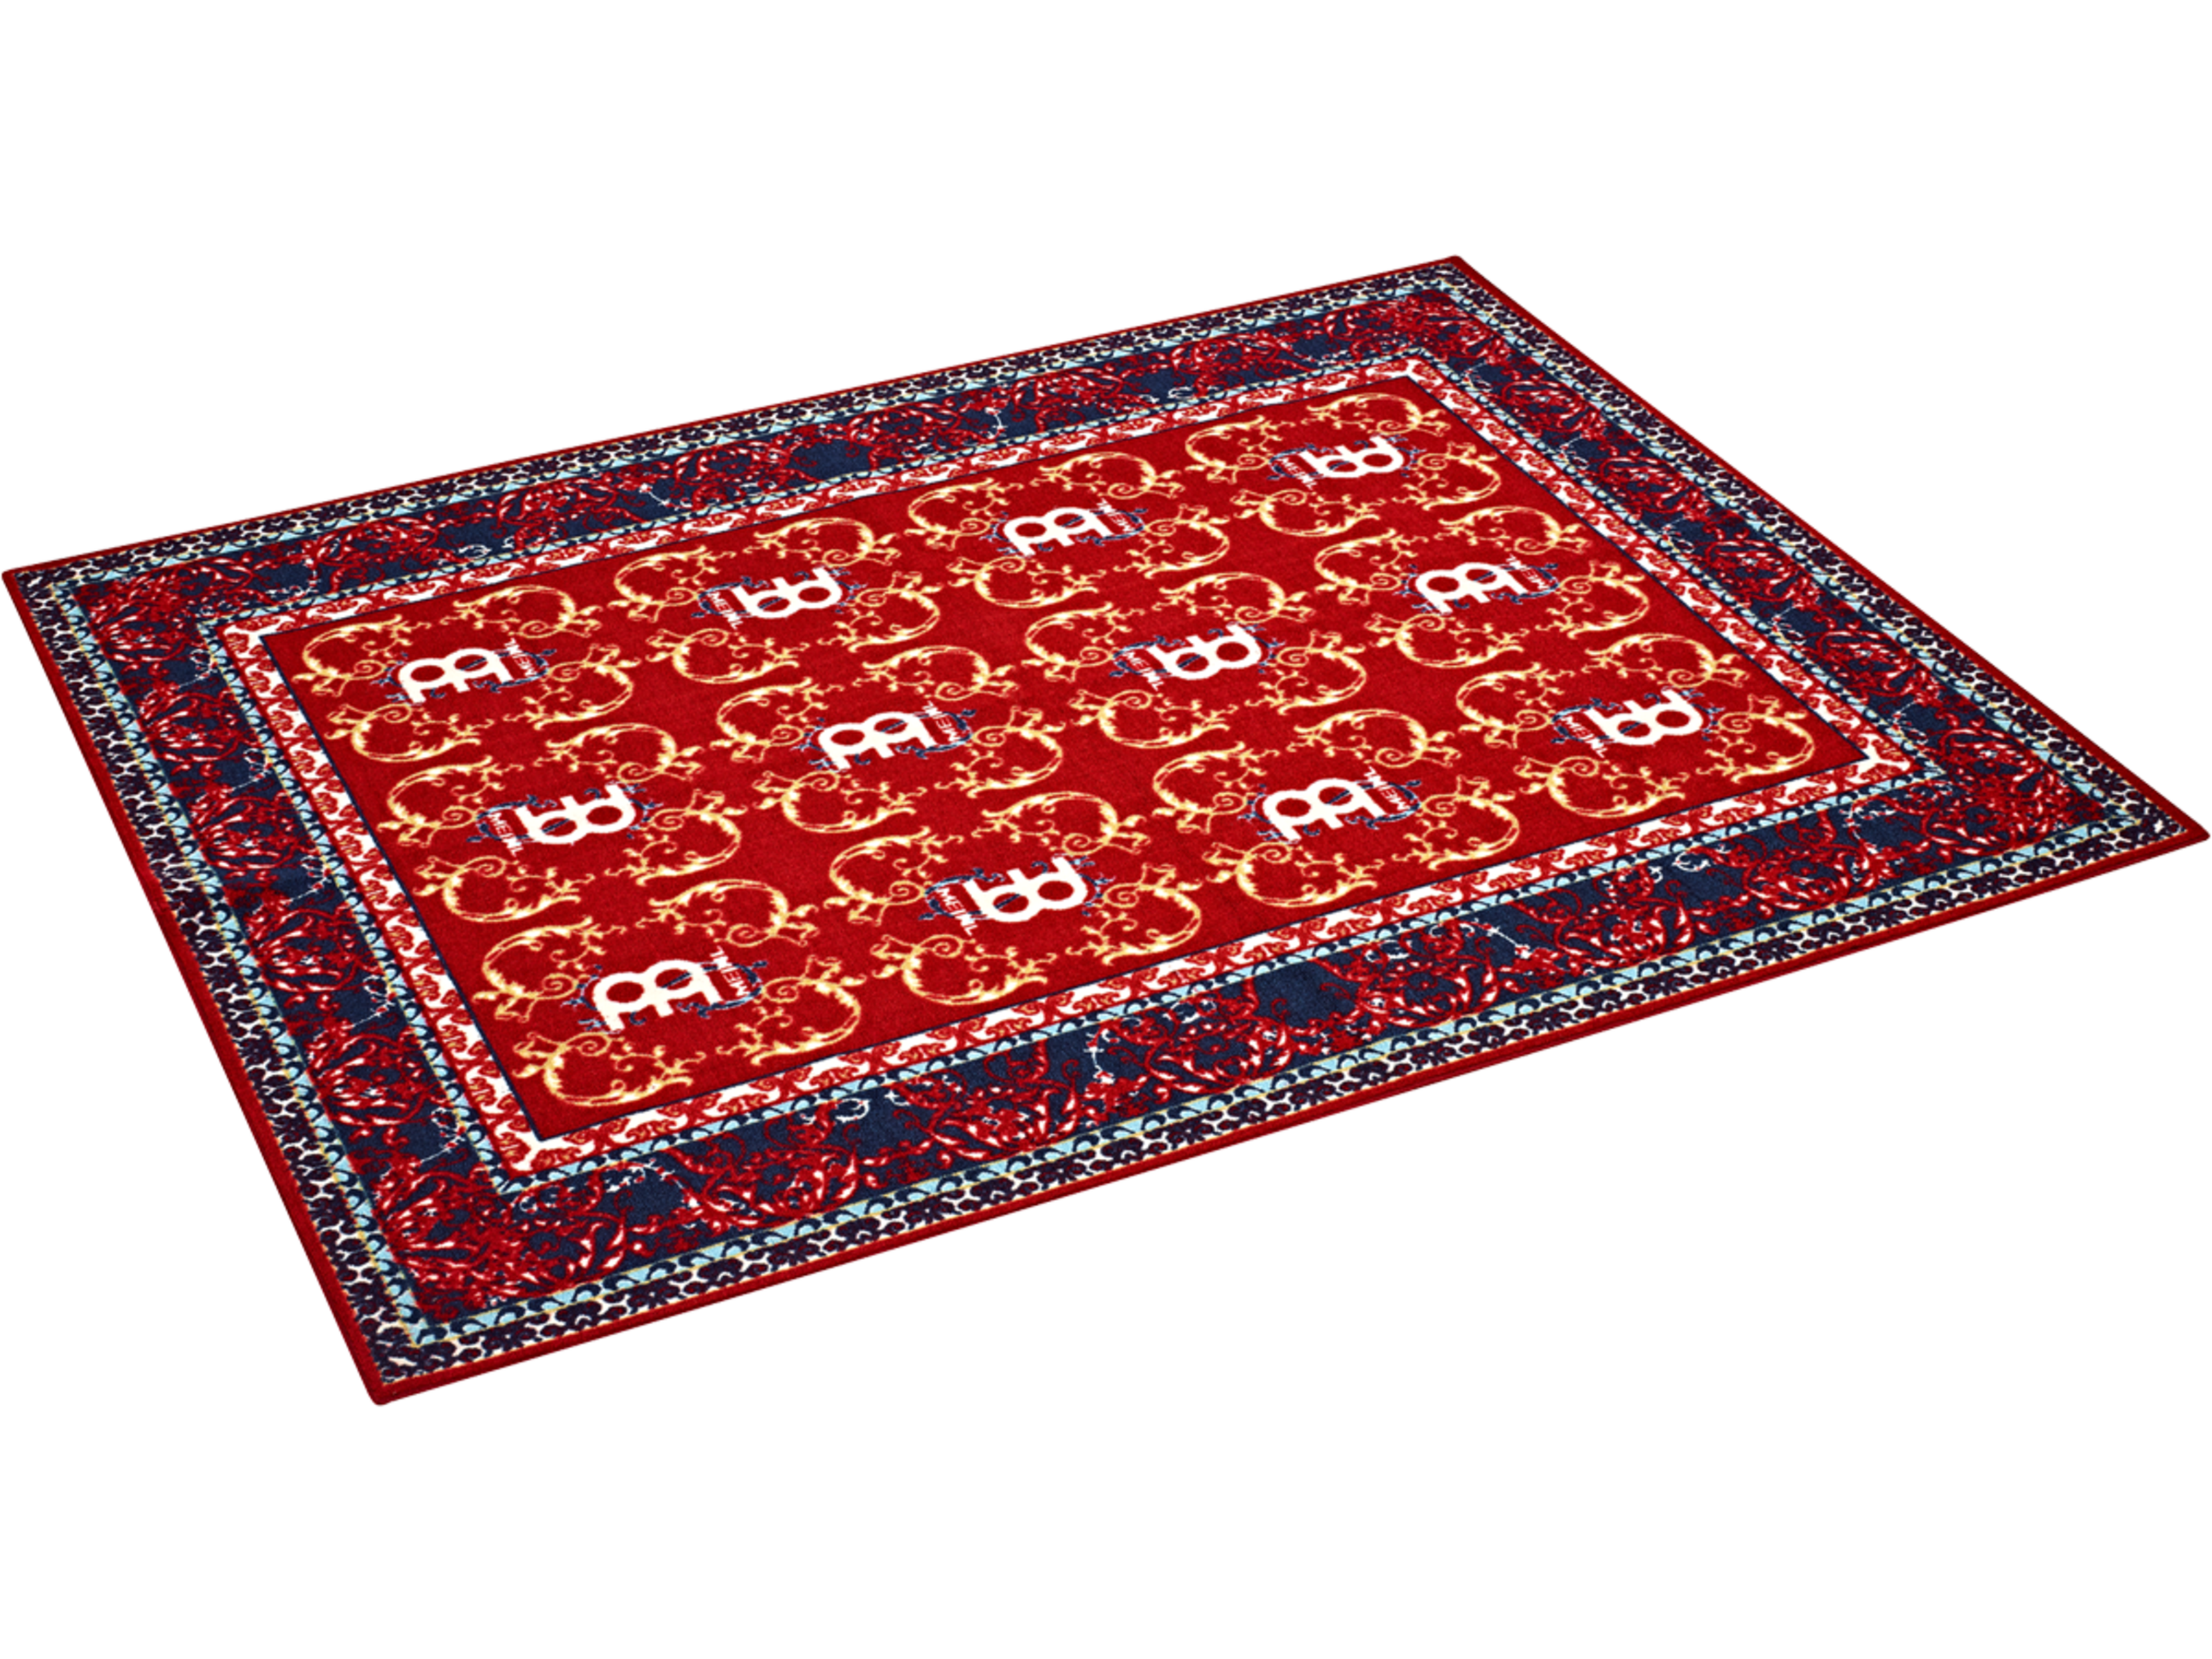 Carpet clipart red rug. Download free png transparent